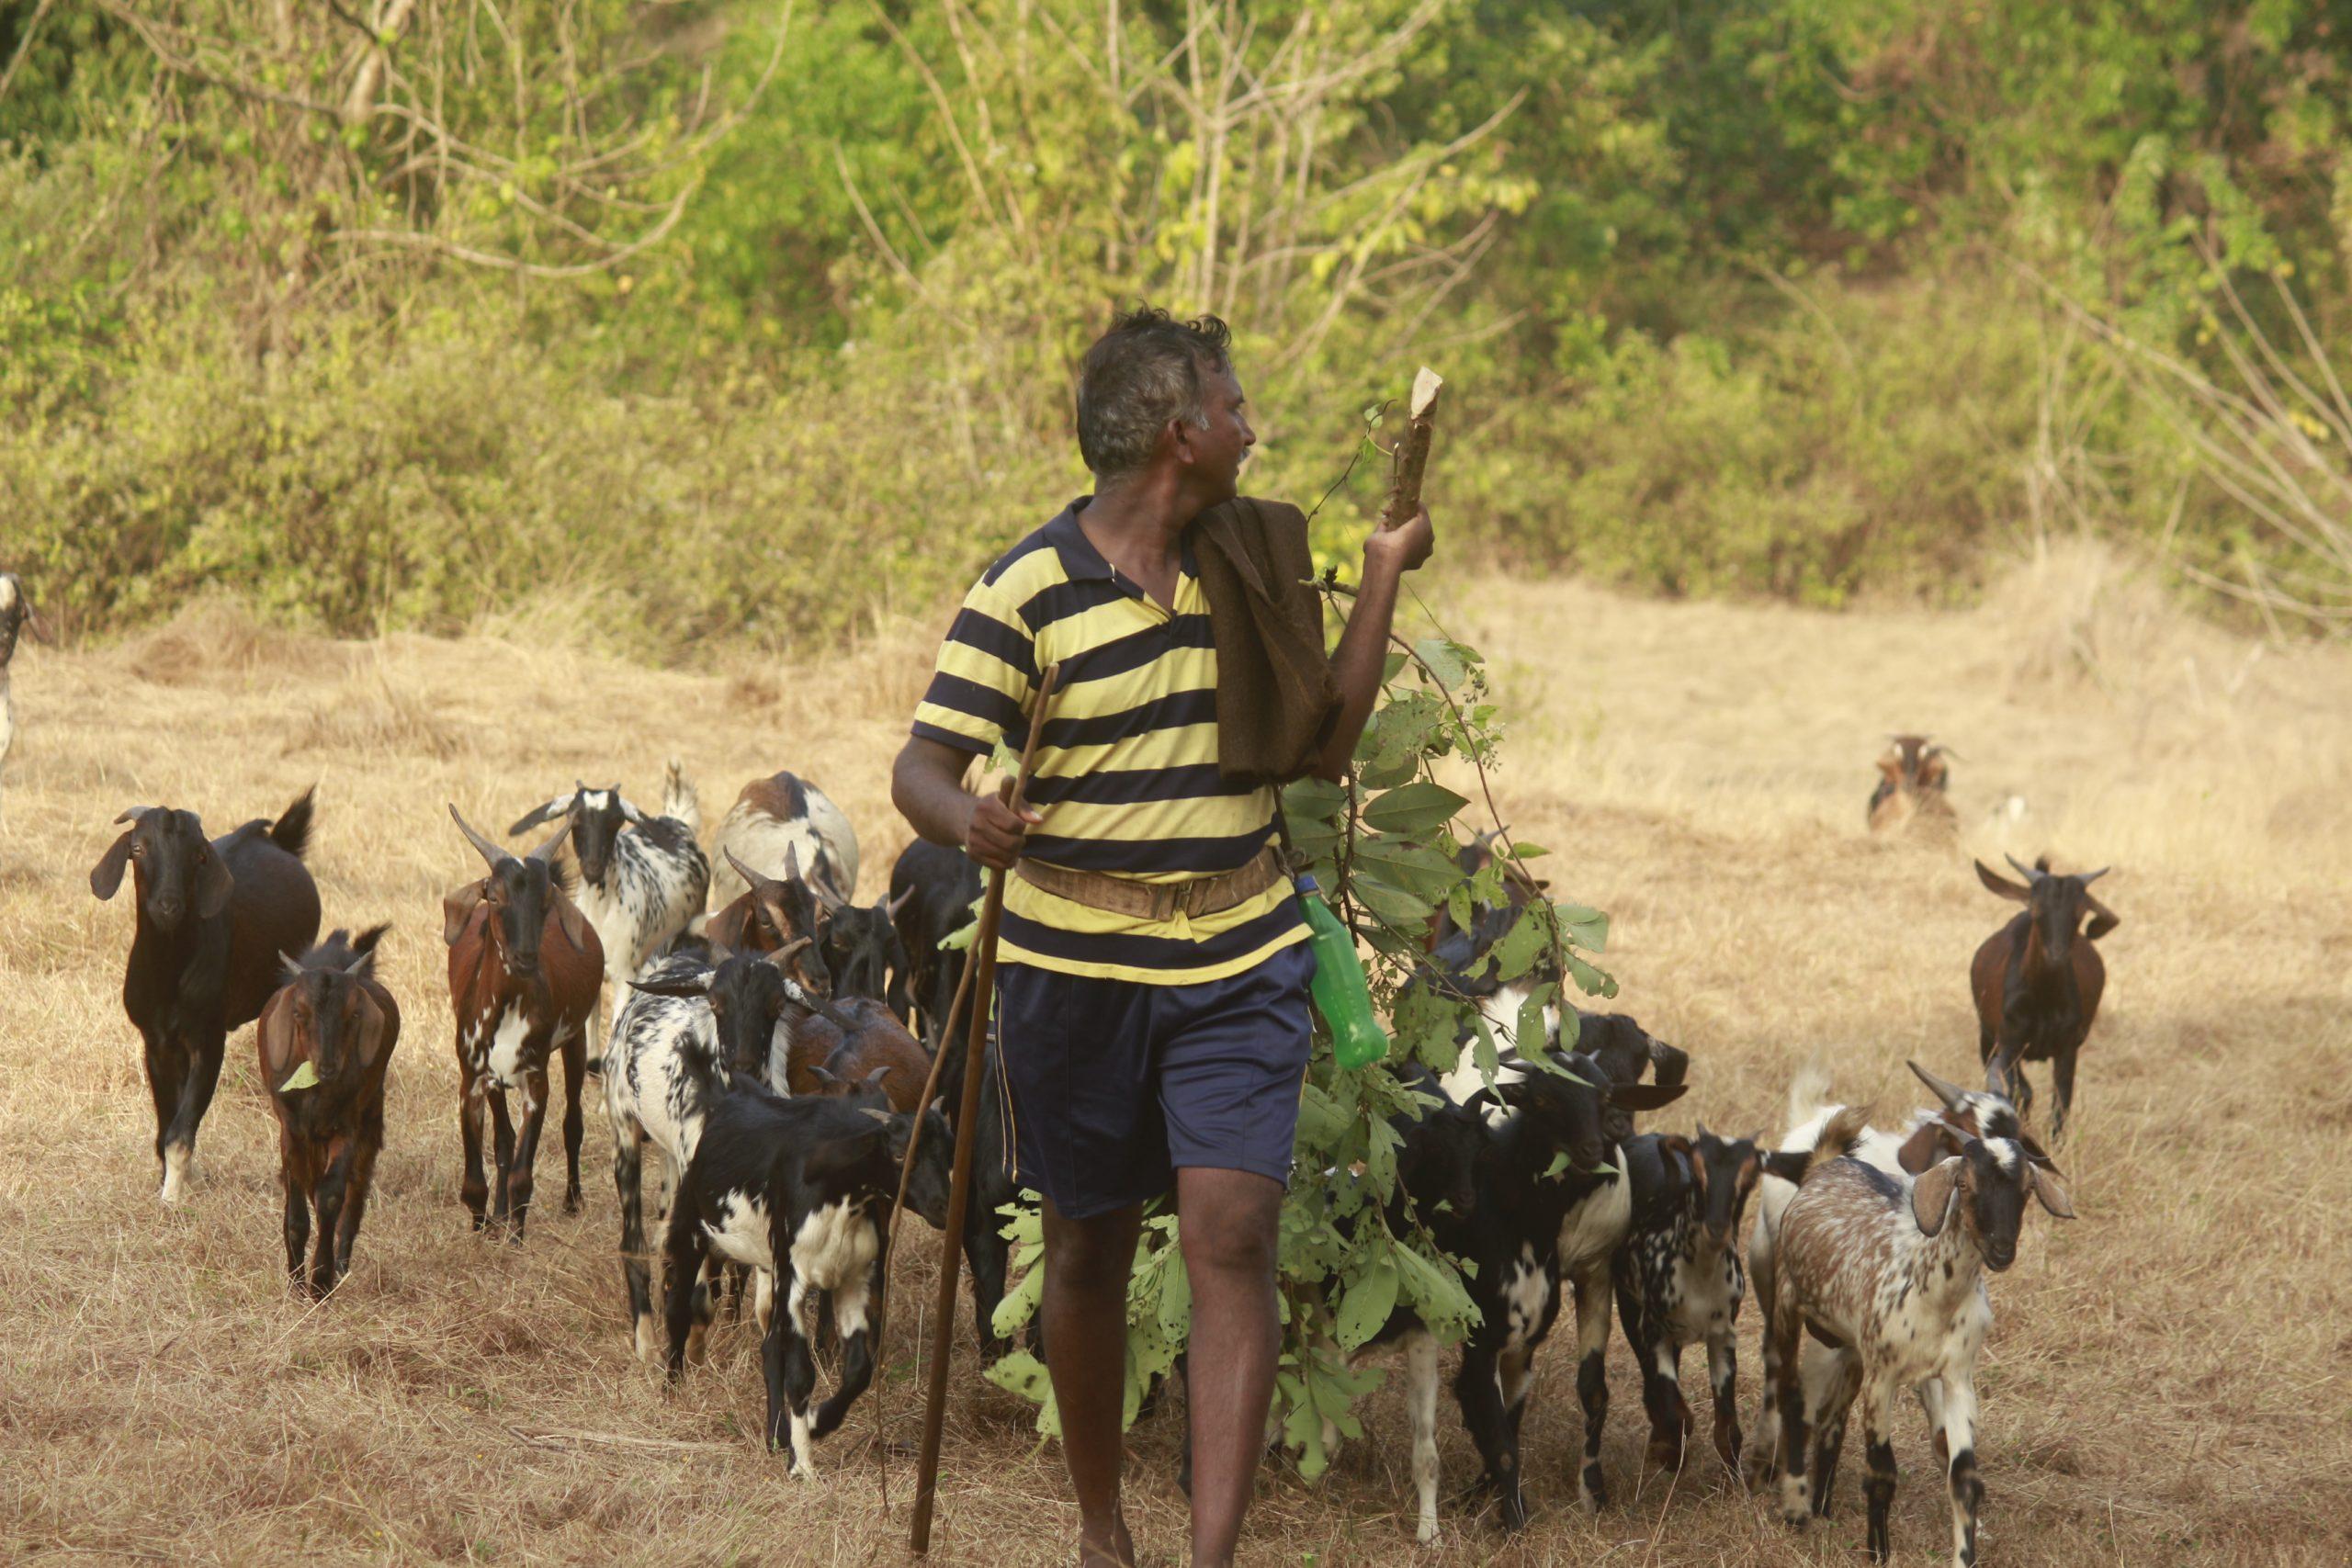 Man grazing goats in the farm